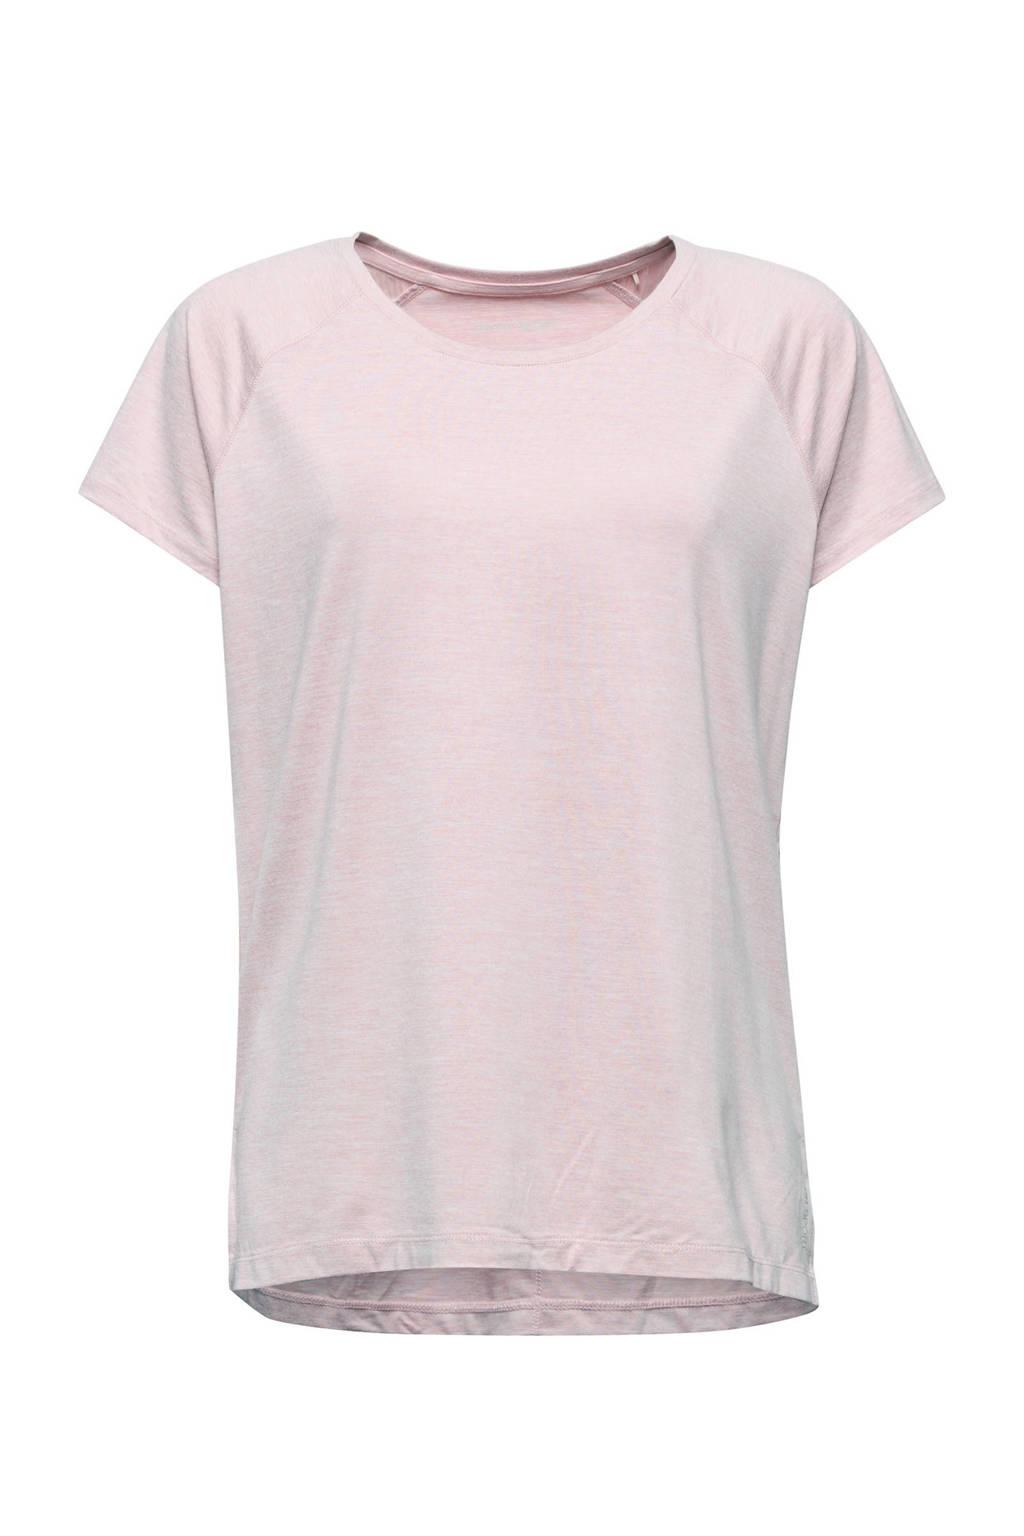 ESPRIT Women Sports sport T-shirt lichtroze, Lichtroze